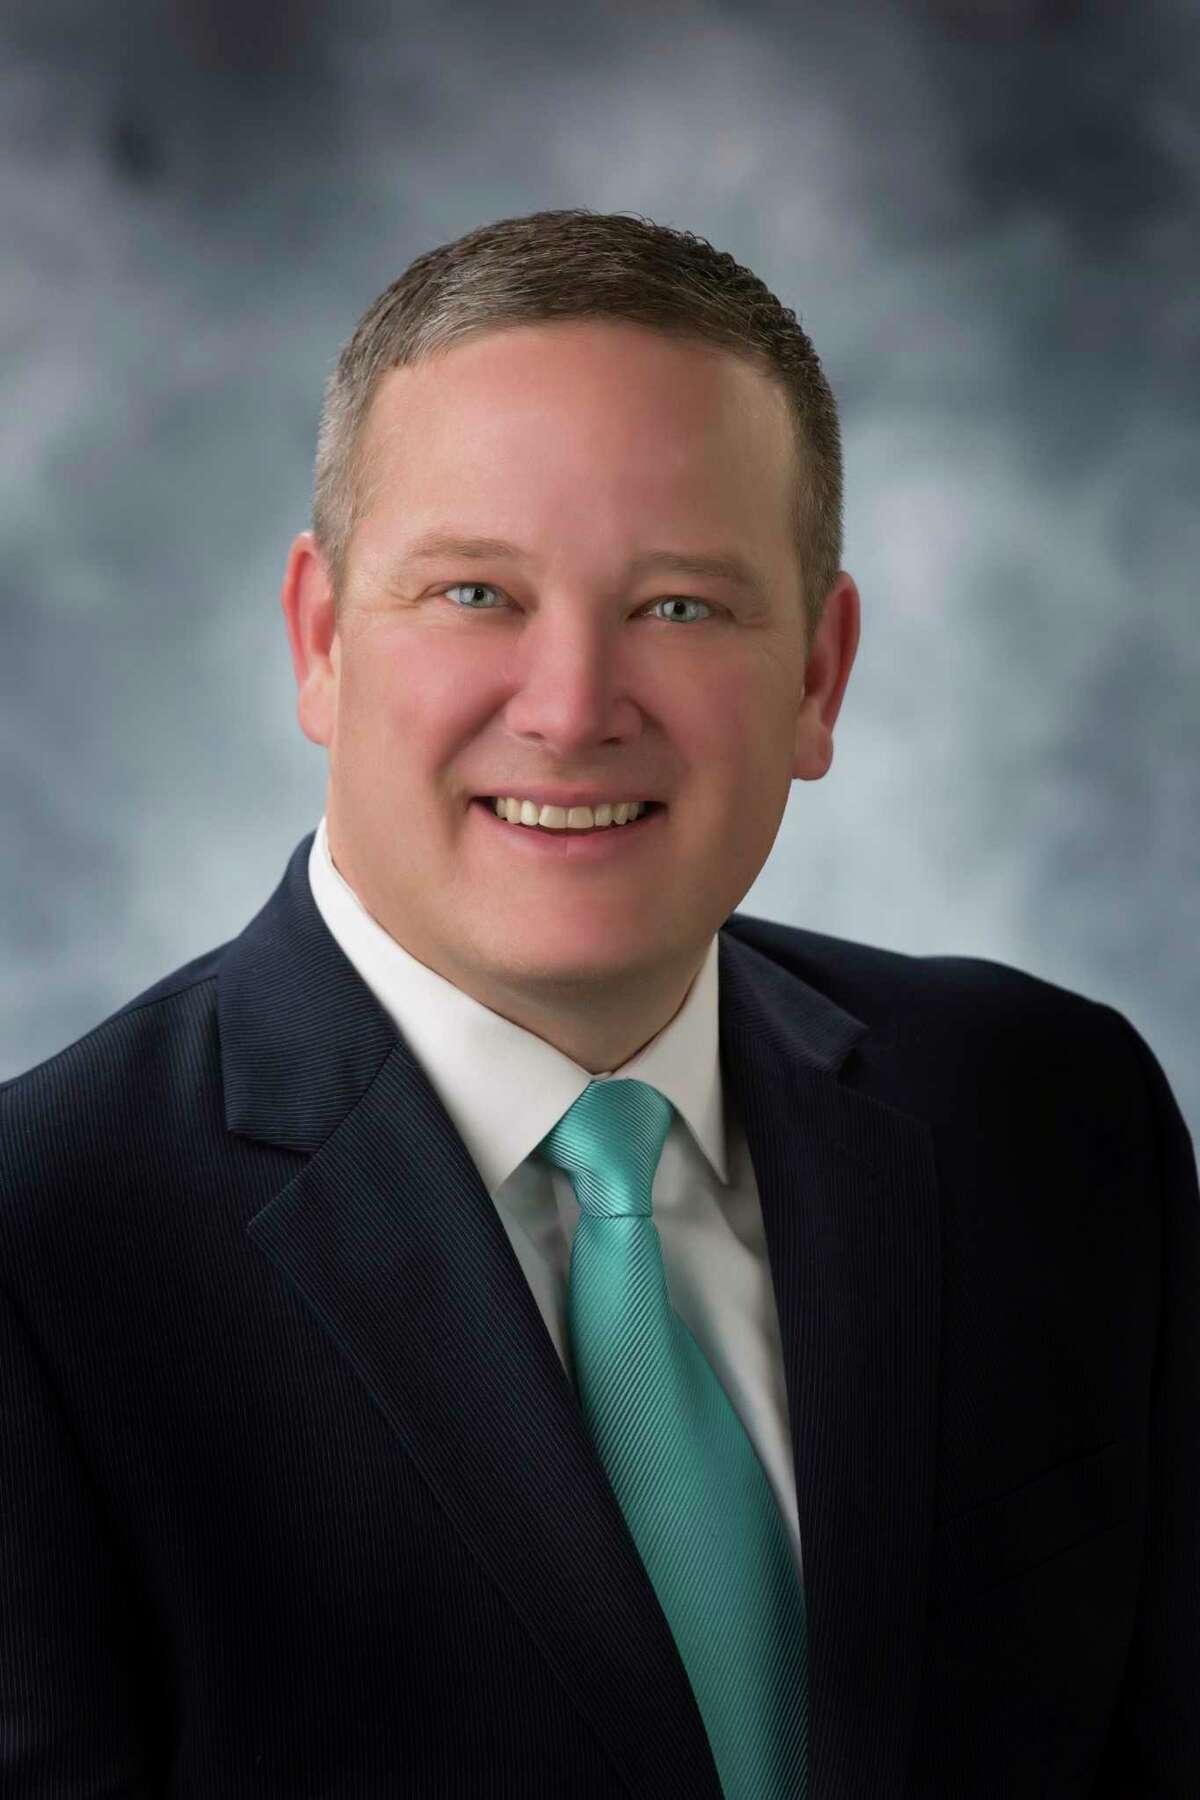 Michael Gavin